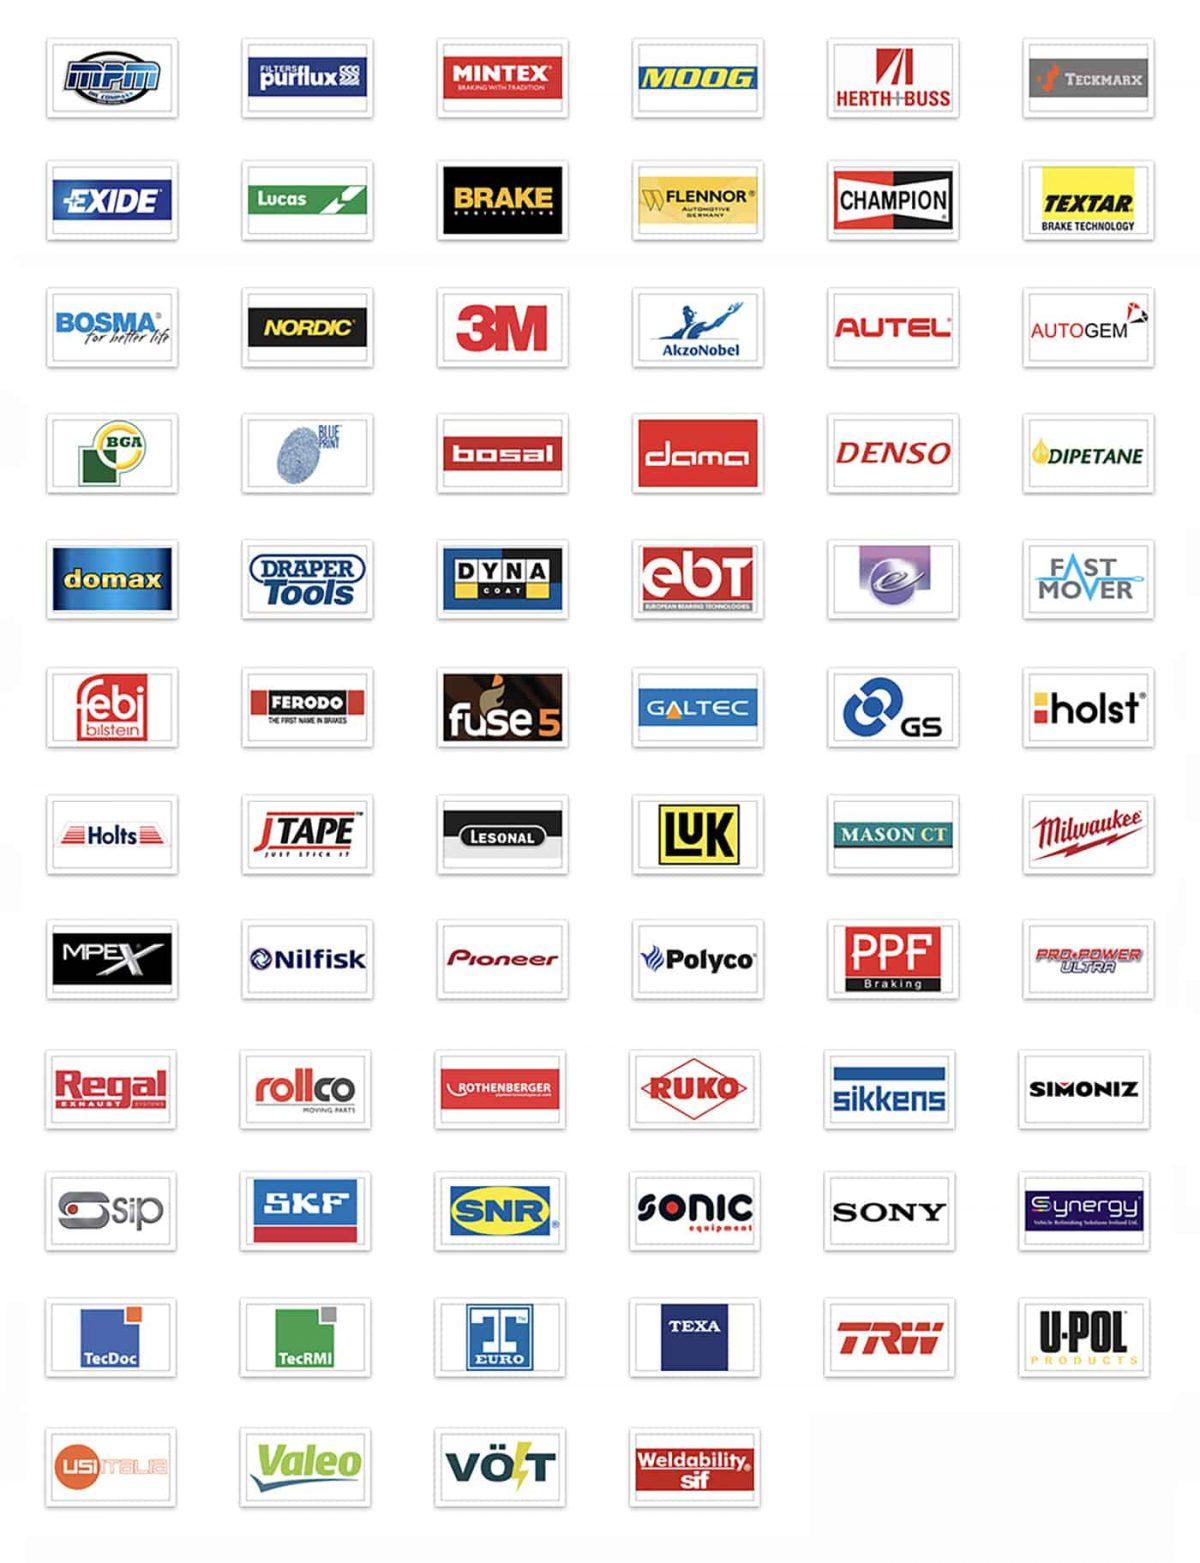 logos_brands_page_revamp_20190606